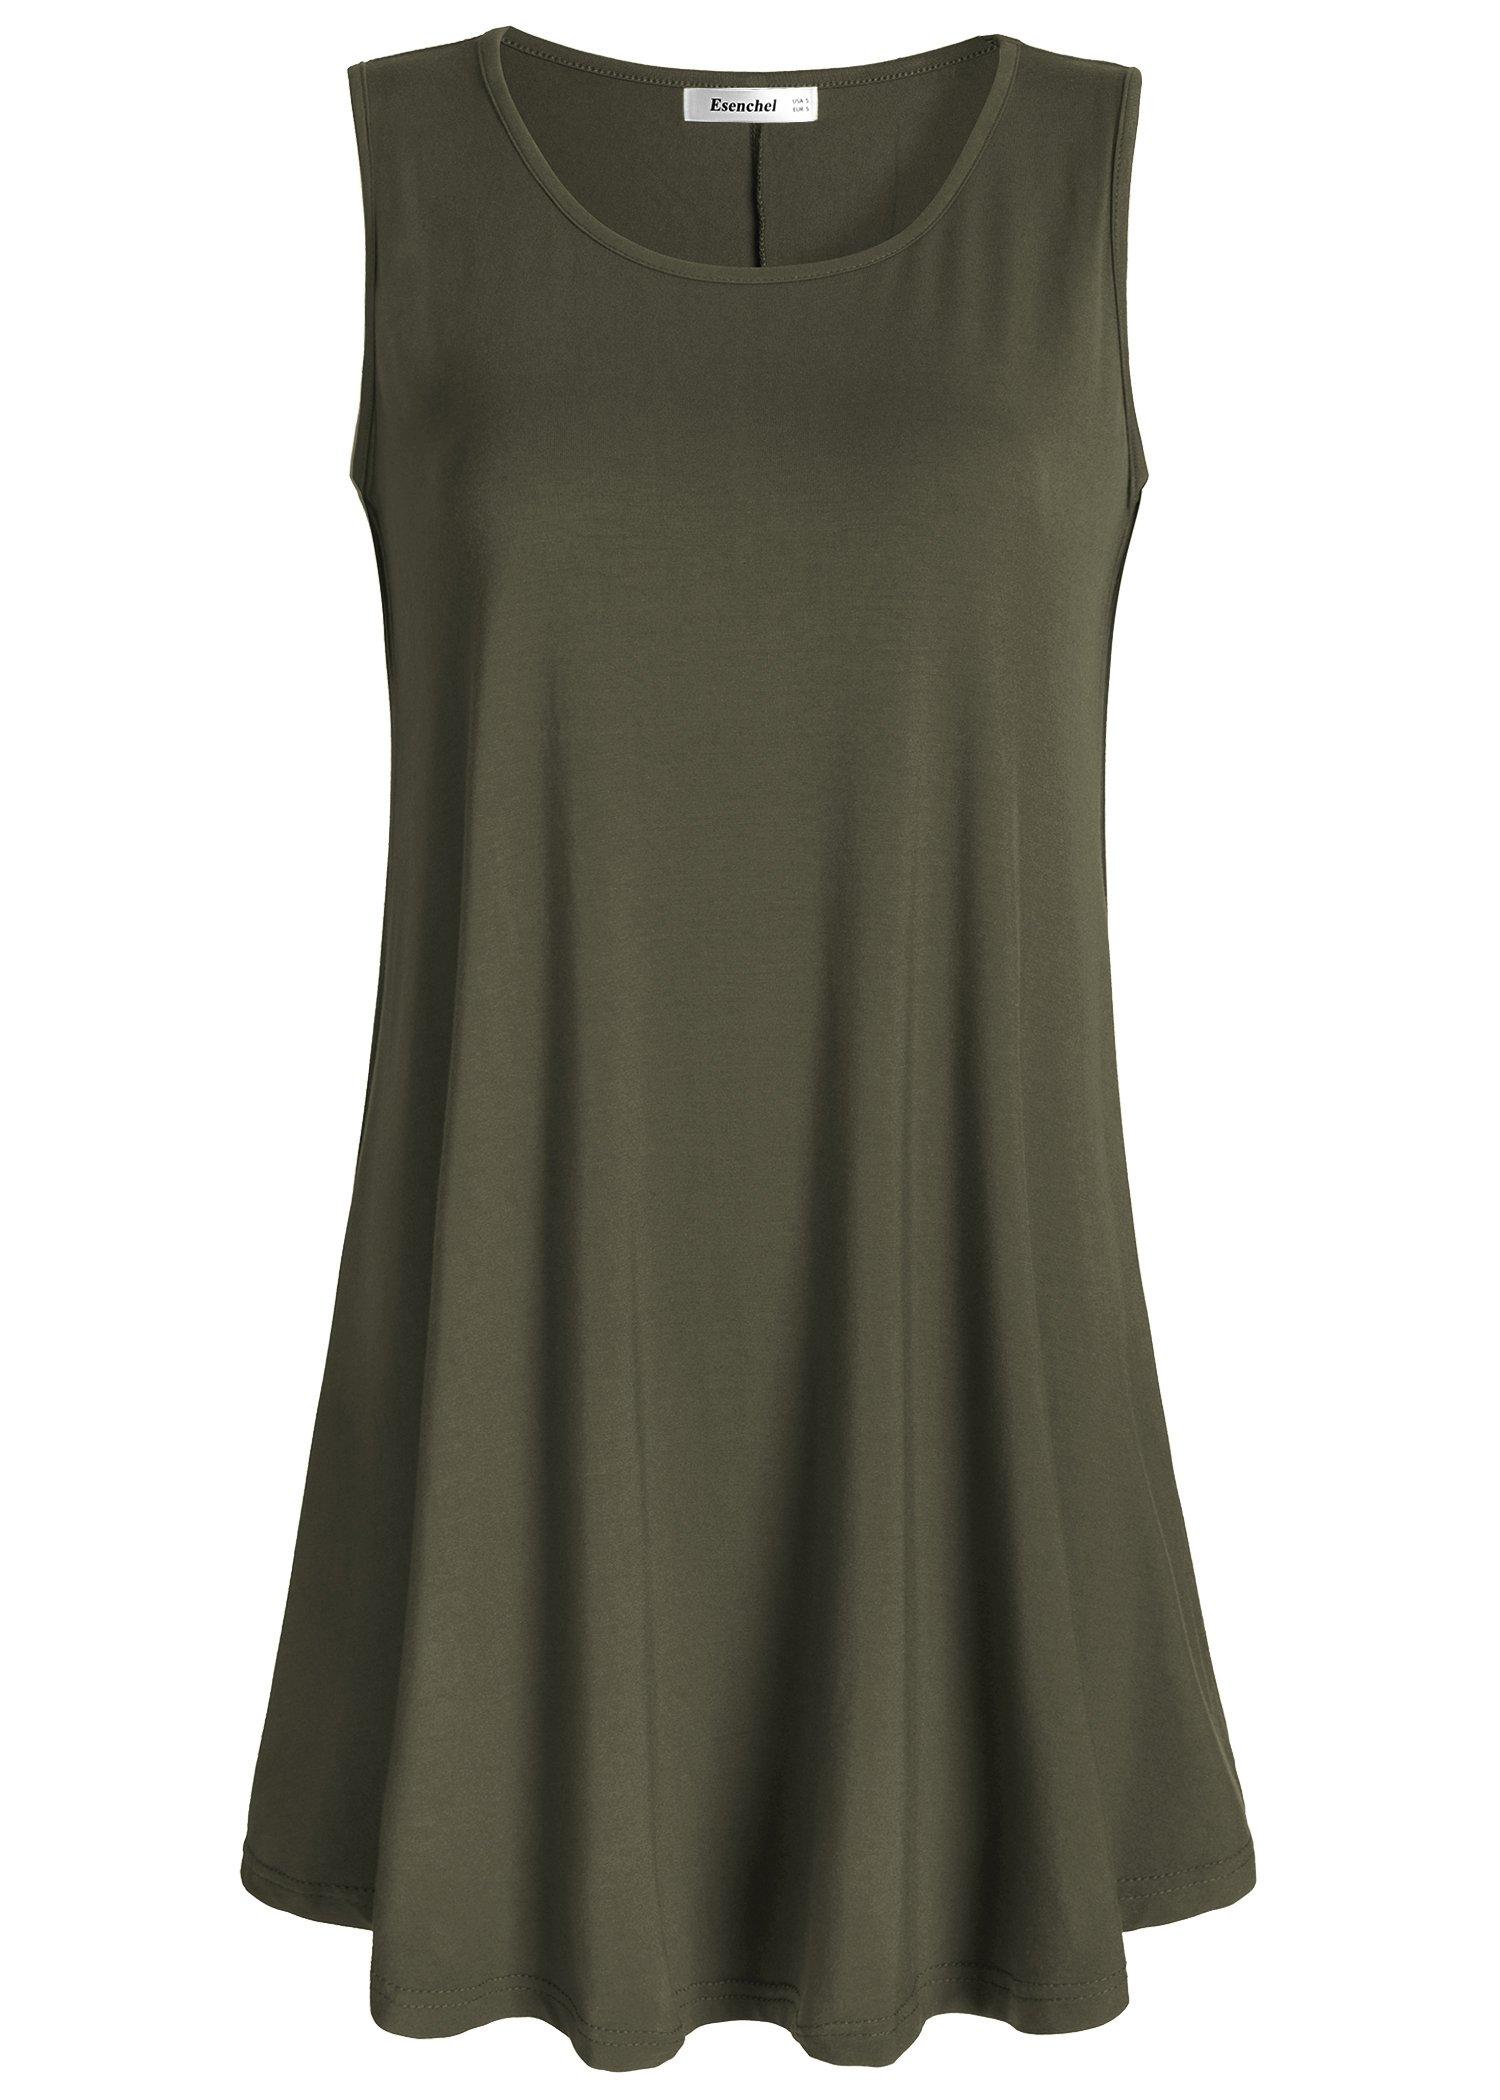 Esenchel Women's Flowy Sleeveless Tunic Top for Leggings XL Army Green